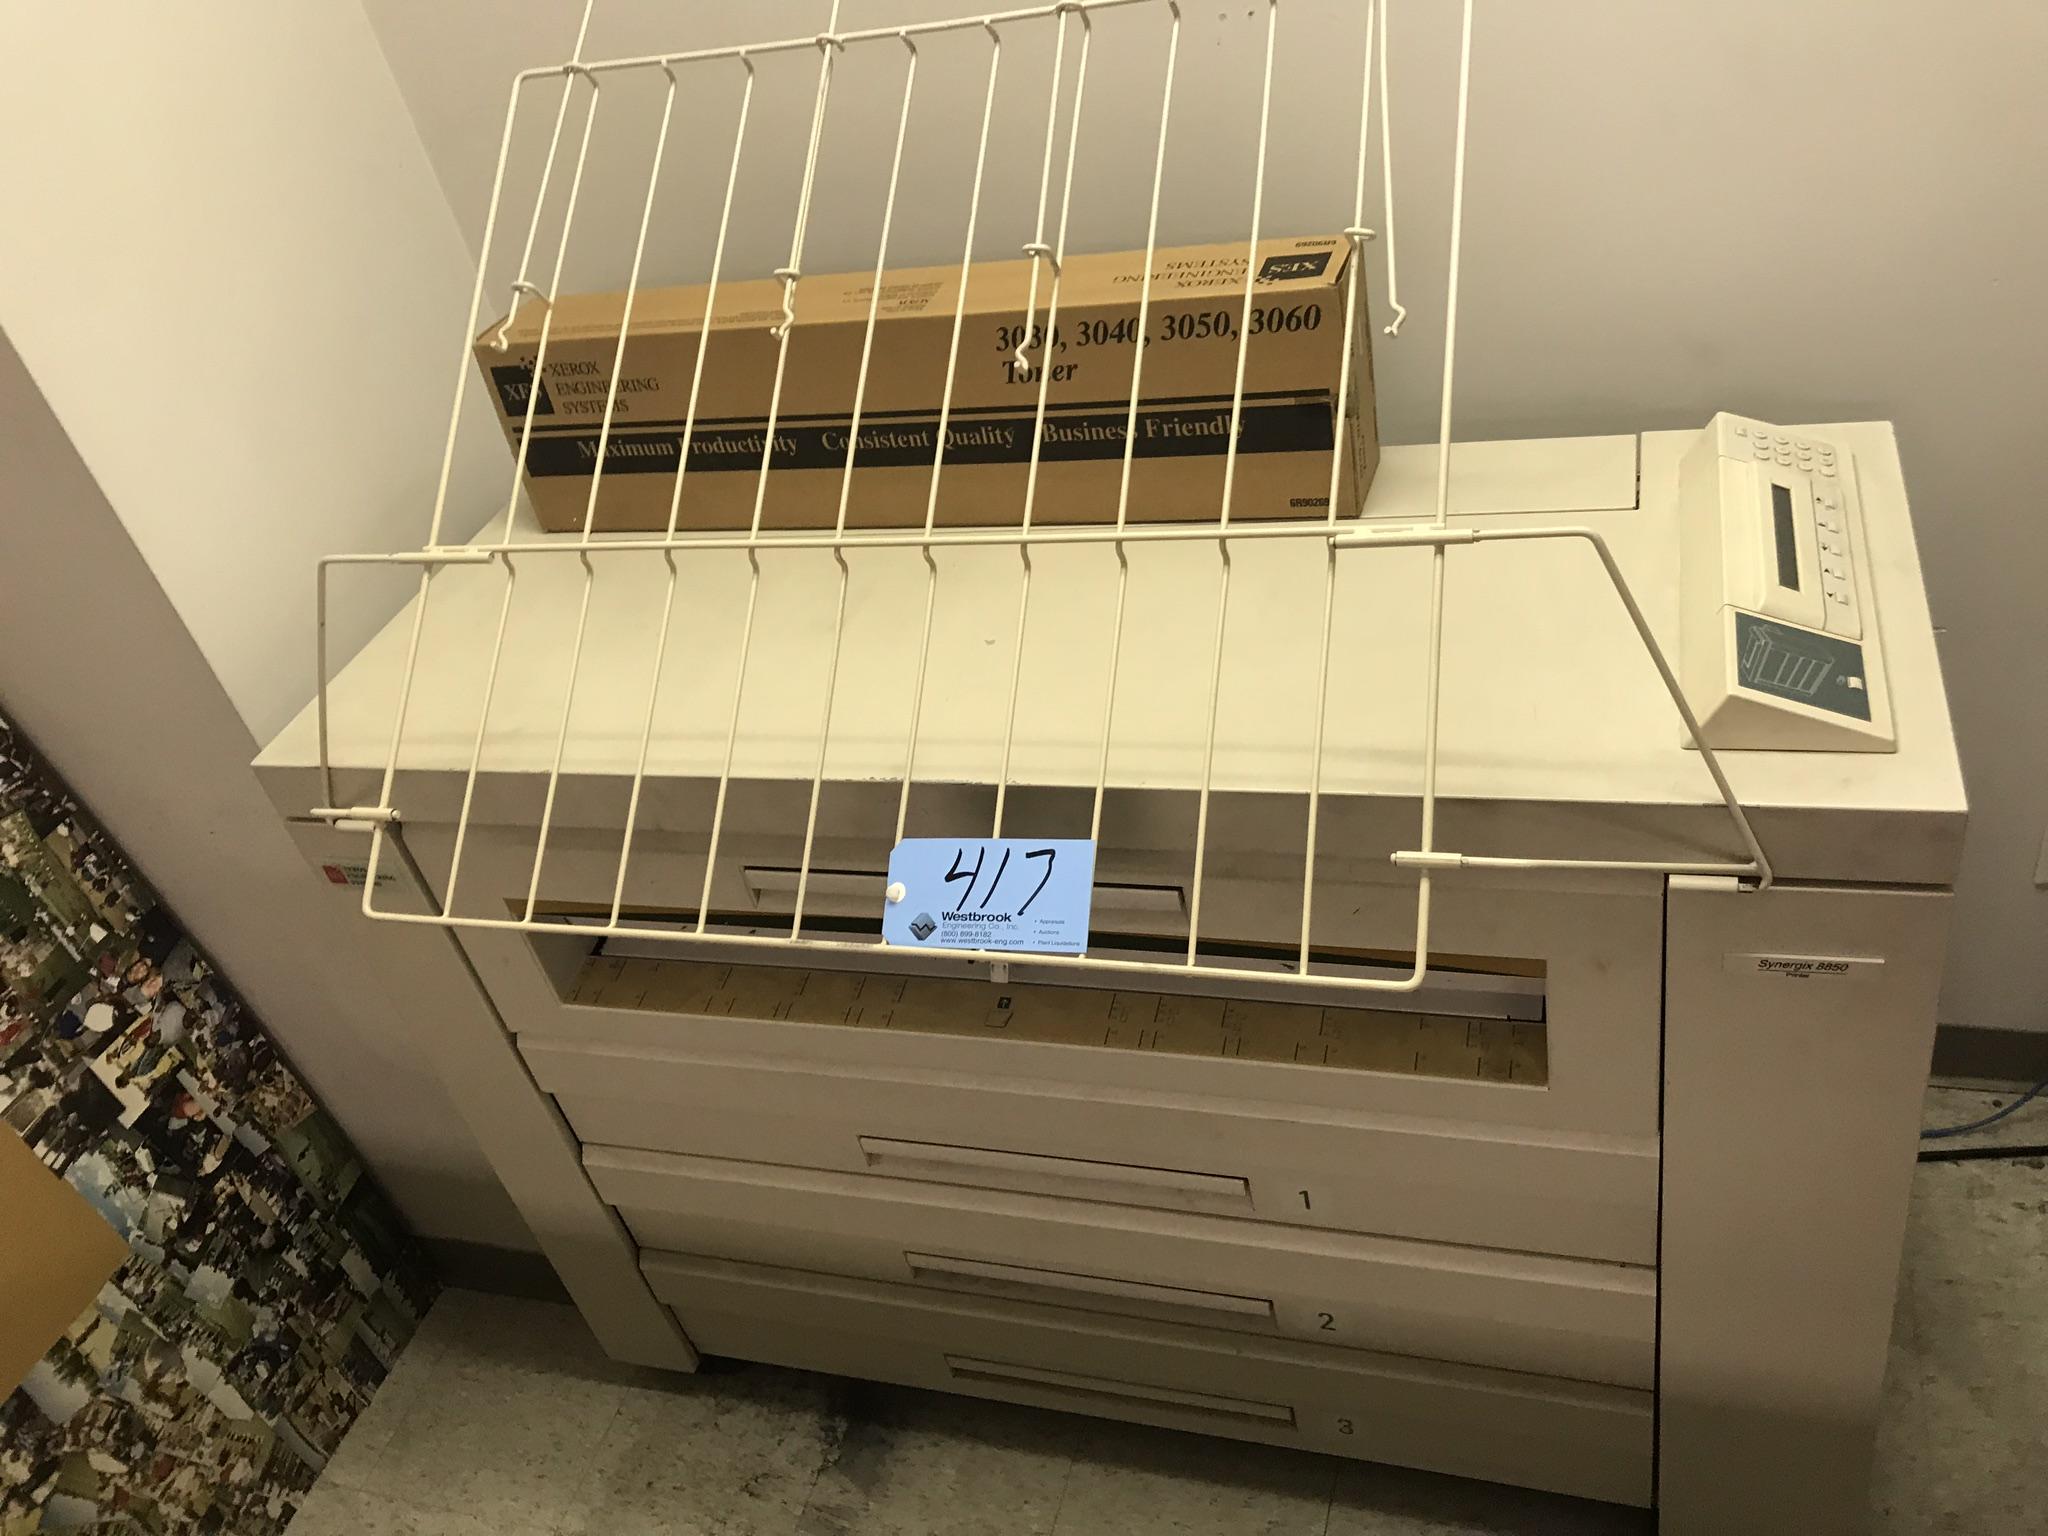 Xerox Synergix 8850, Blue Print Copier, S/n N/a, (Office #118)